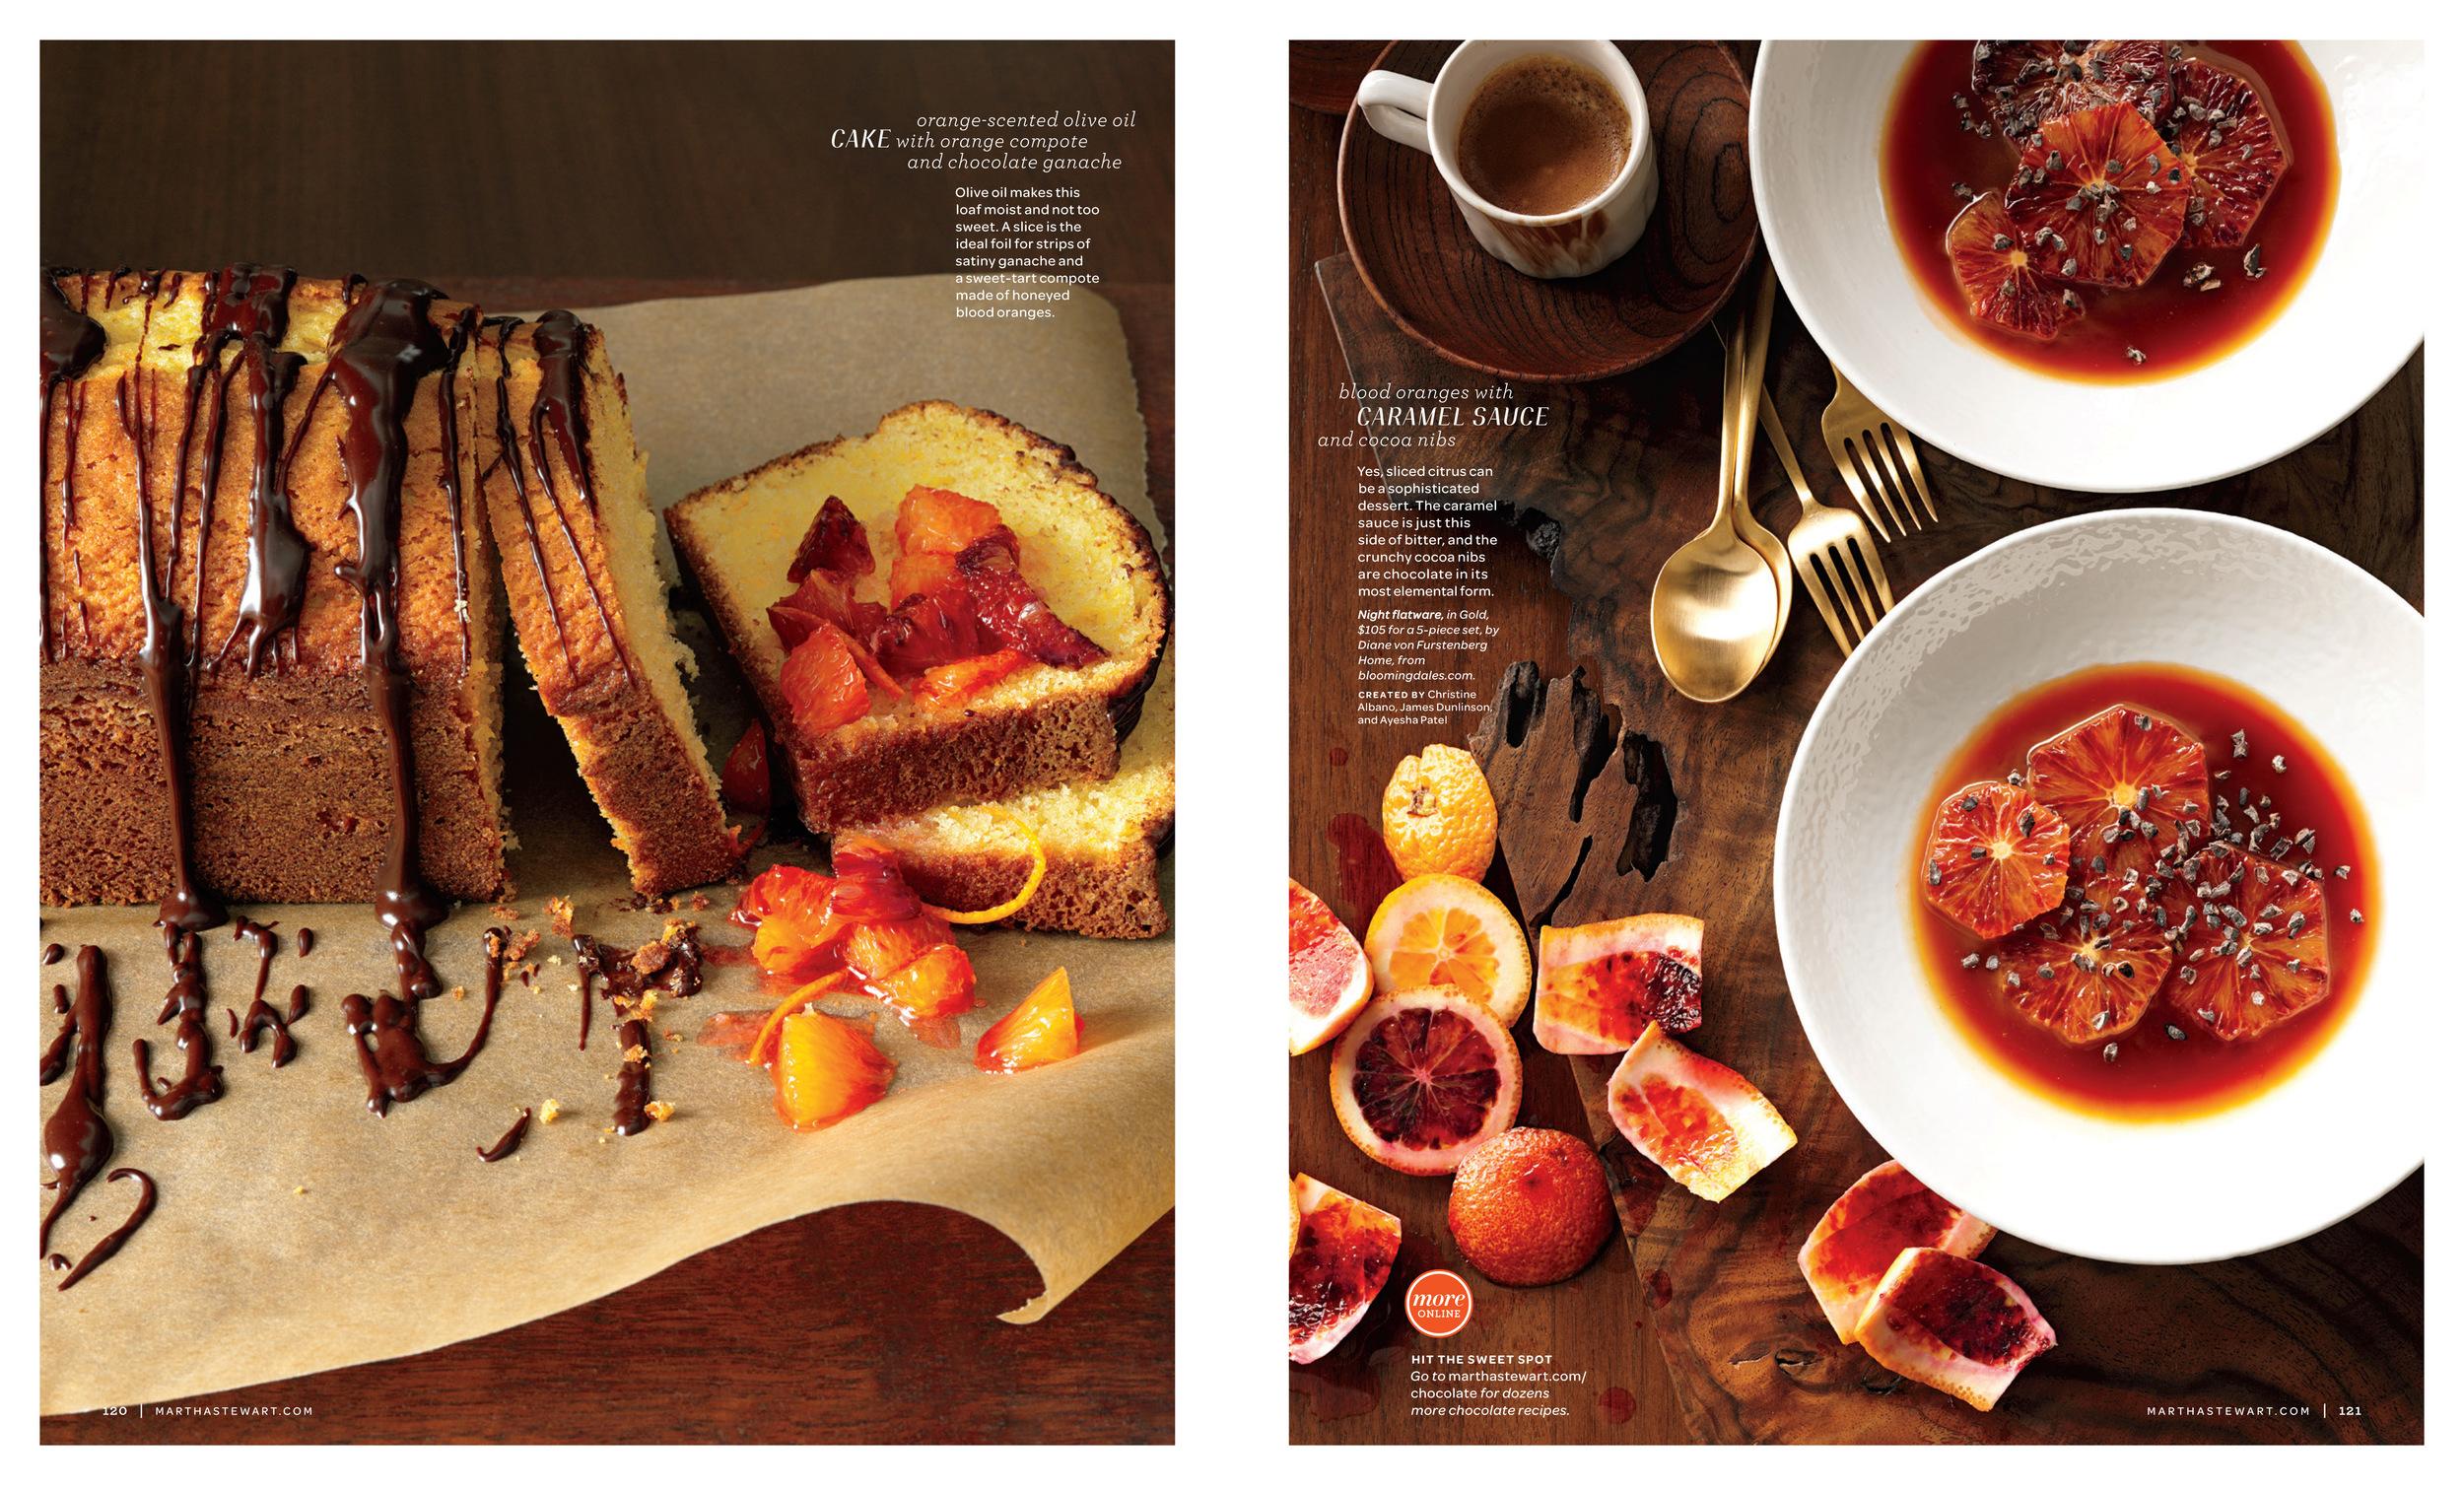 Citrus-and-chocolate-2-3.jpg